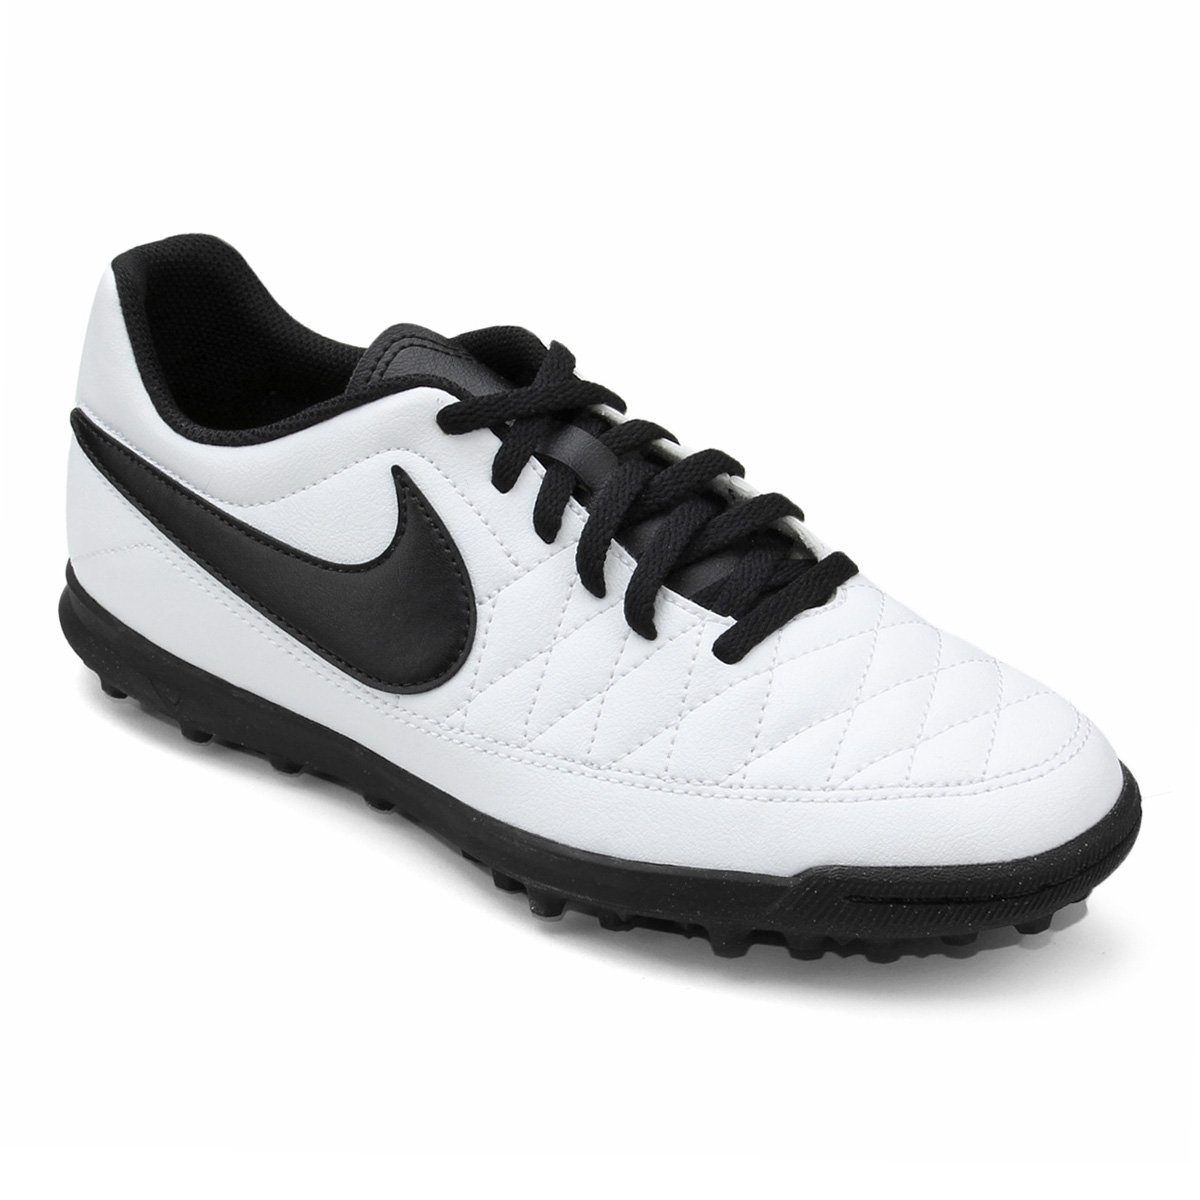 6345d22c5f9da Chuteira Society Nike Majestry TF - Branco e Preto - Compre Agora ...